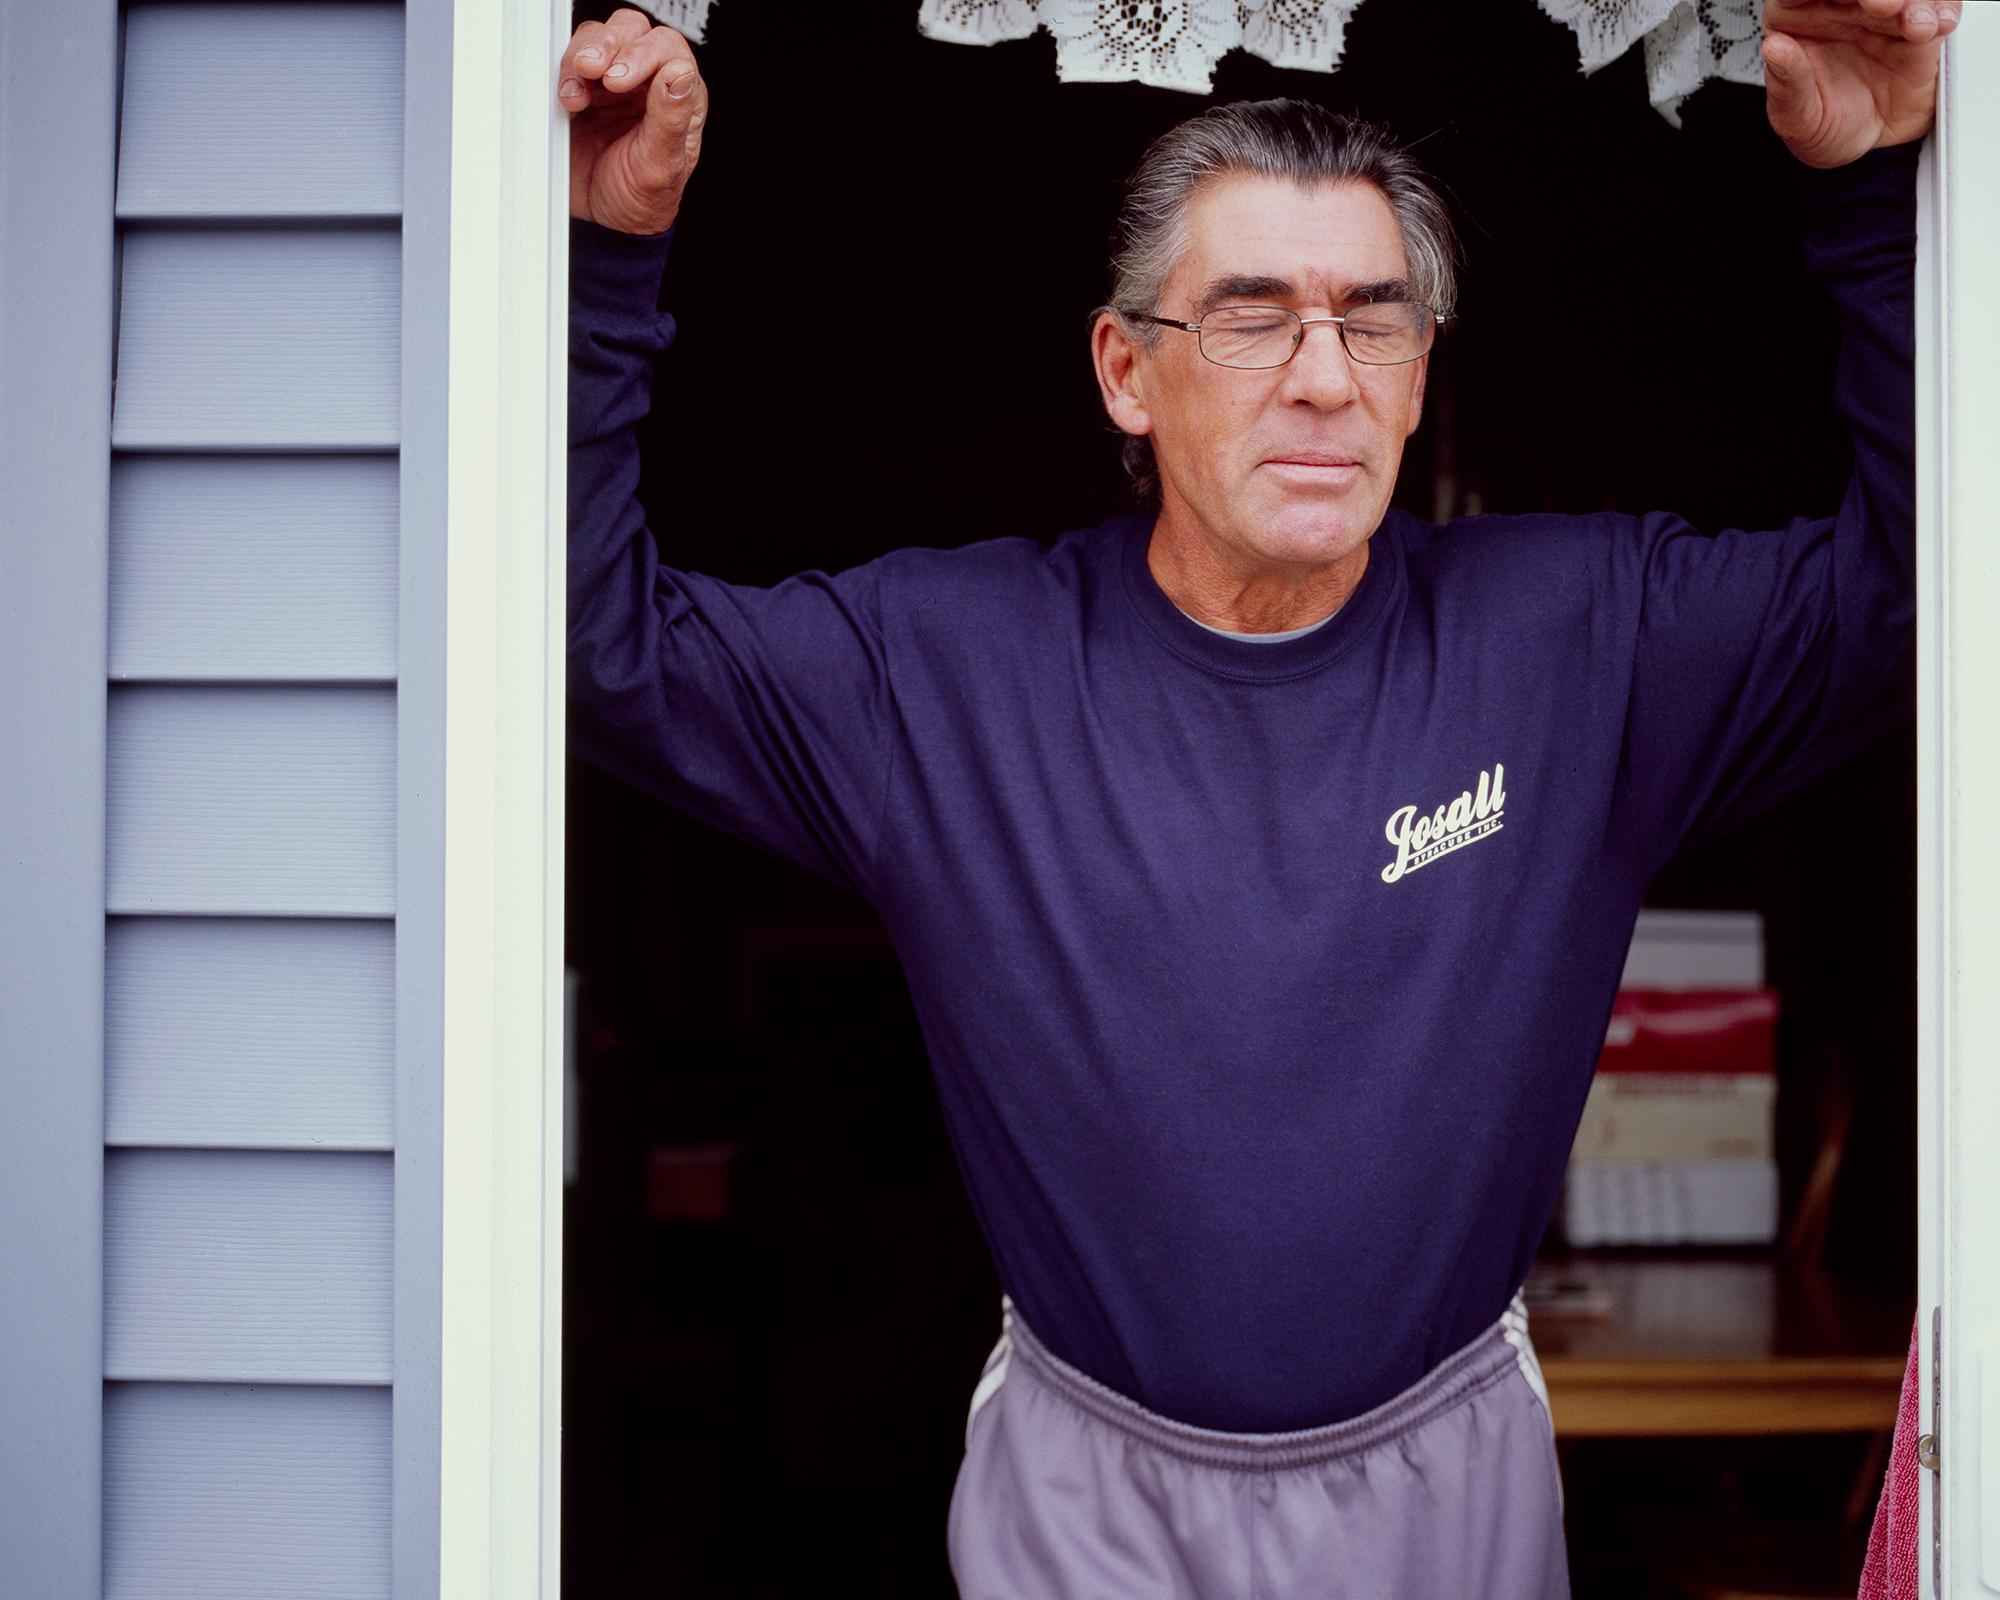 Kevin in the Doorway